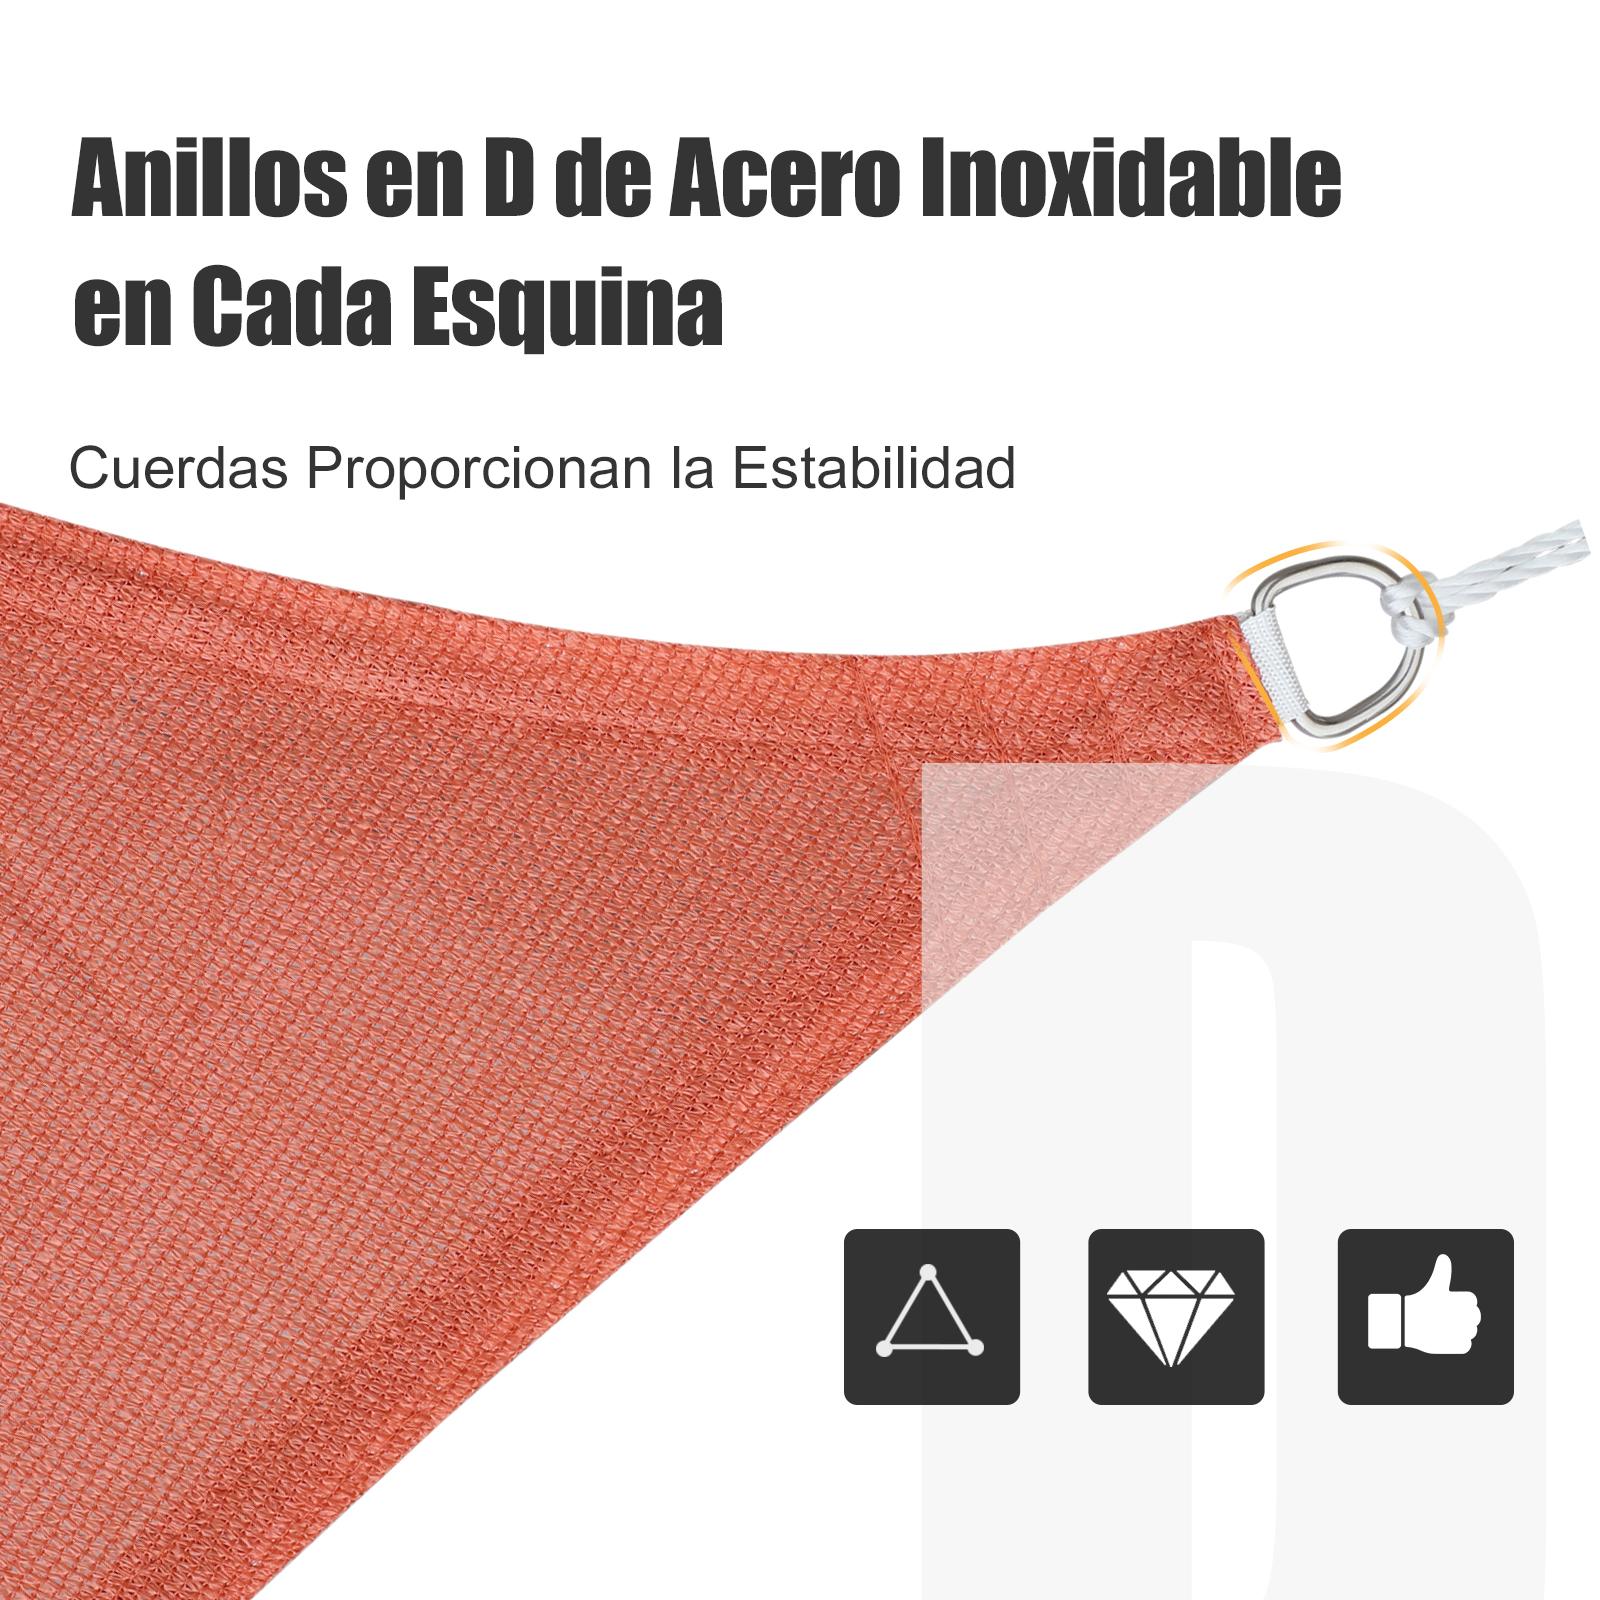 Toldo-Vela-Sombrilla-Parasol-Triangulo-Tejido-de-Poliester-185-g-m-Jardin-Playa miniatura 27